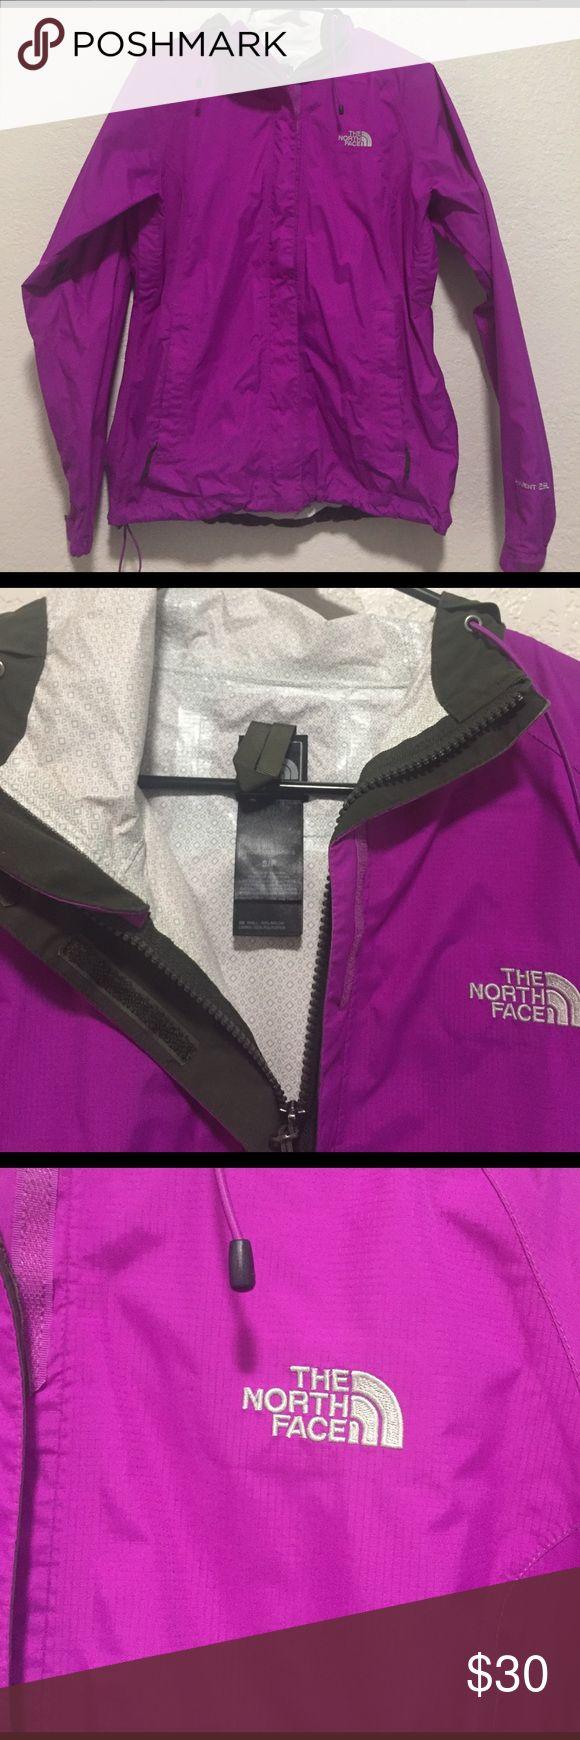 Small purple/fushia north-face windbreaker Light weight windbreaker jacket from North Face. It is in nearly perfect condition. North Face Jackets & Coats